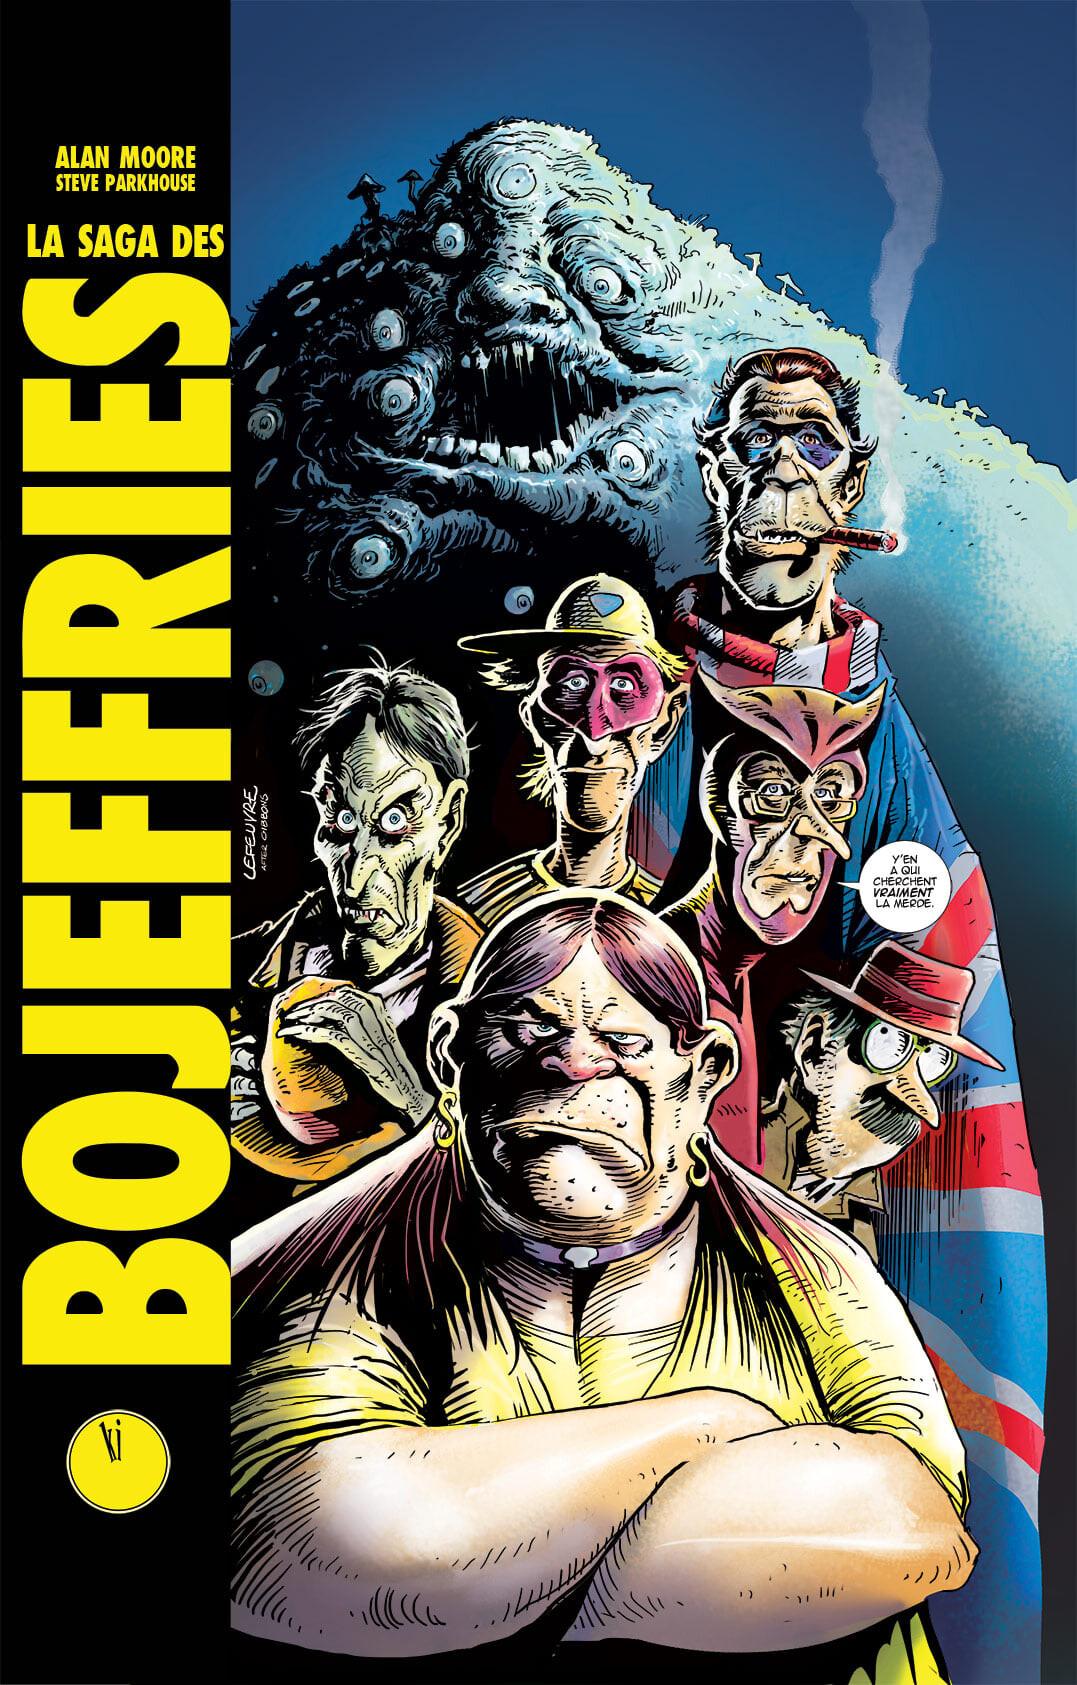 LA SAGA DES BOJEFFRIES (Alan Moore / Steve Parkhouse) - Komics Initiative - Sanctuary